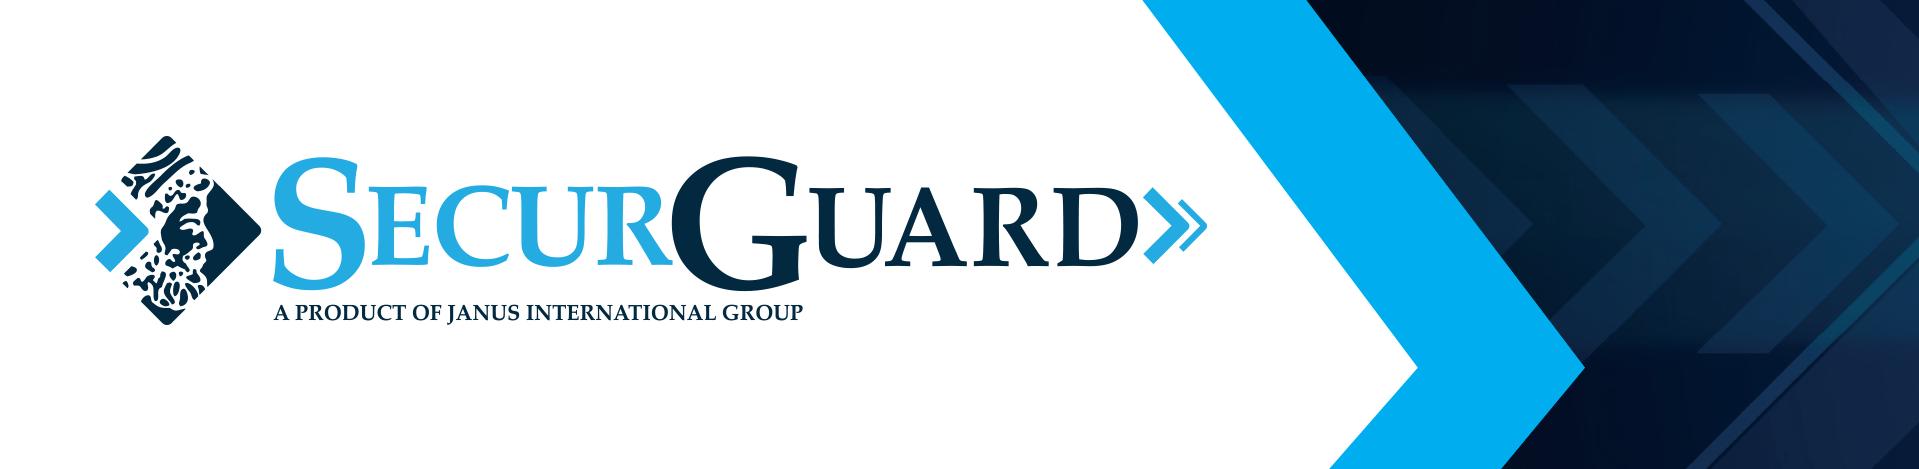 Secur Guard